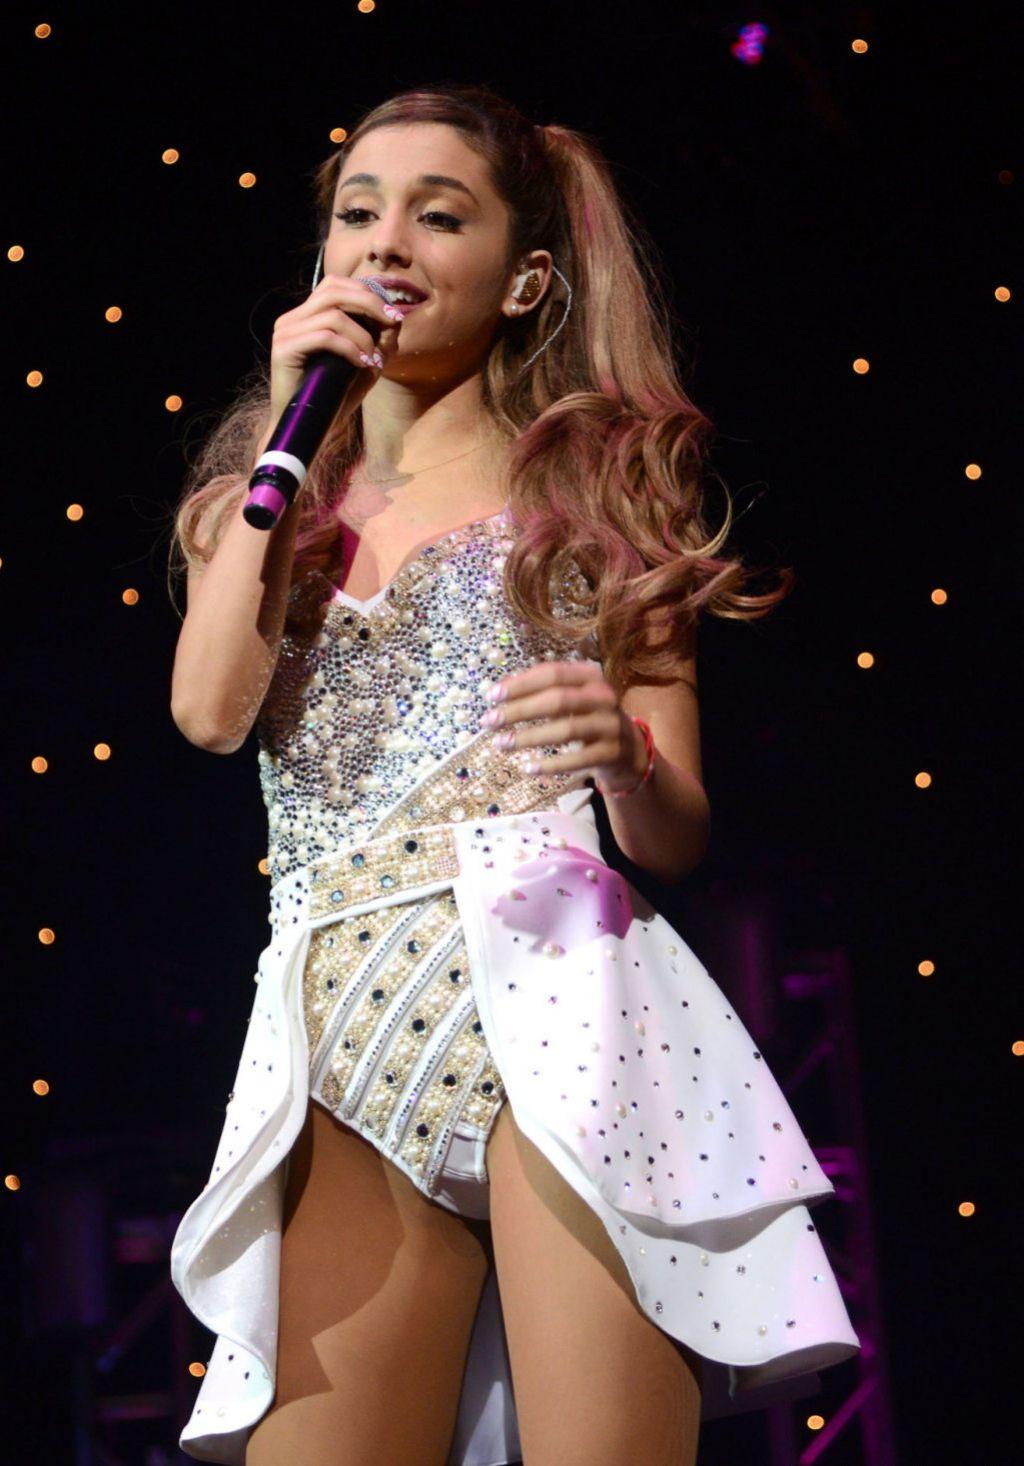 Ariana Grande Performing  at Wild Jam in San Jose - December 2013